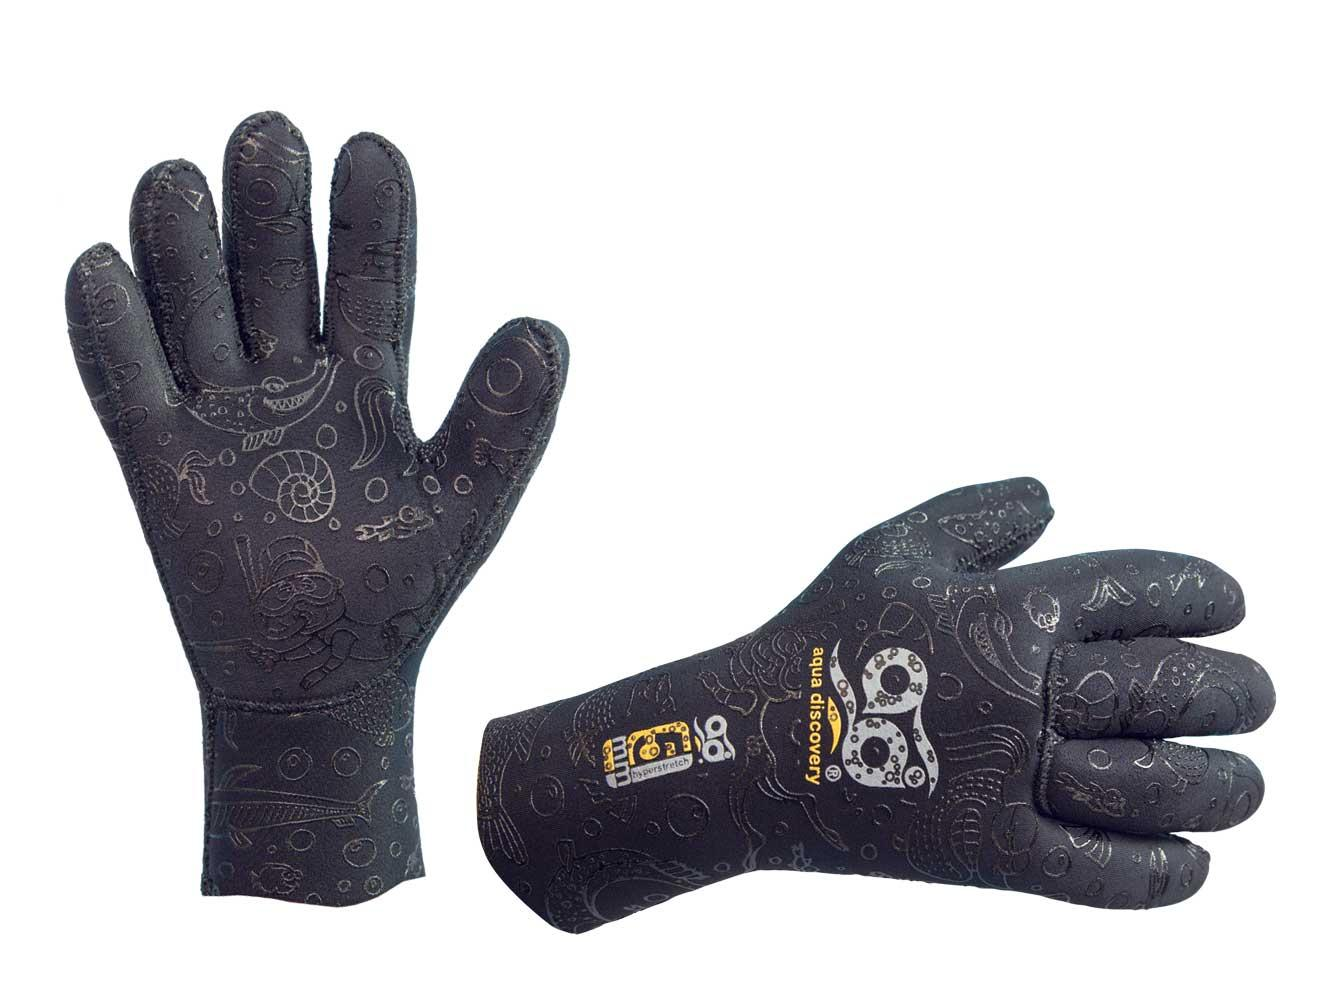 Перчатки Неопреновые Aquadiscovery Hyperstretch